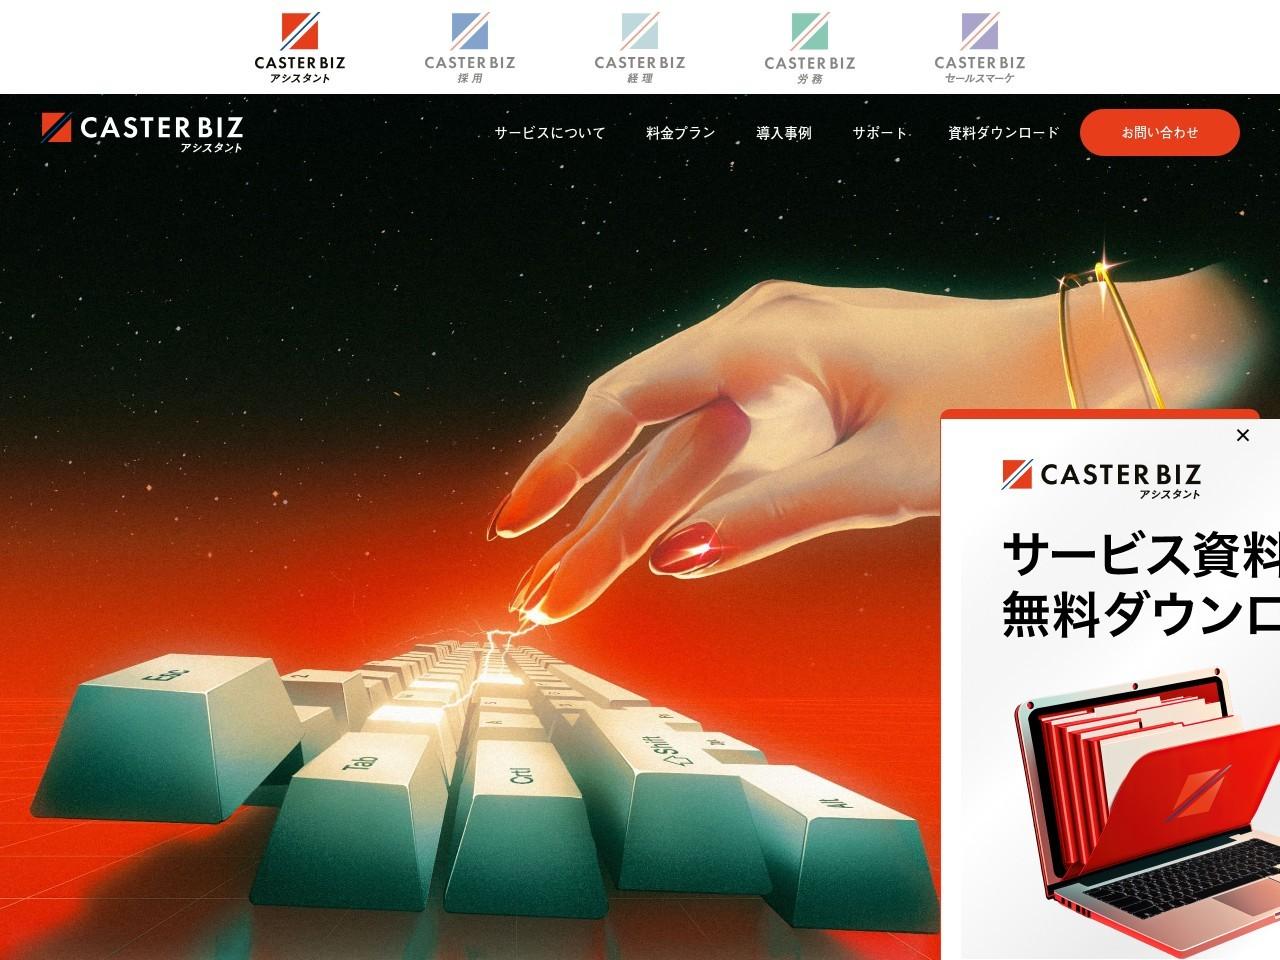 CASTER BIZ - 優秀なオンラインアシスタント